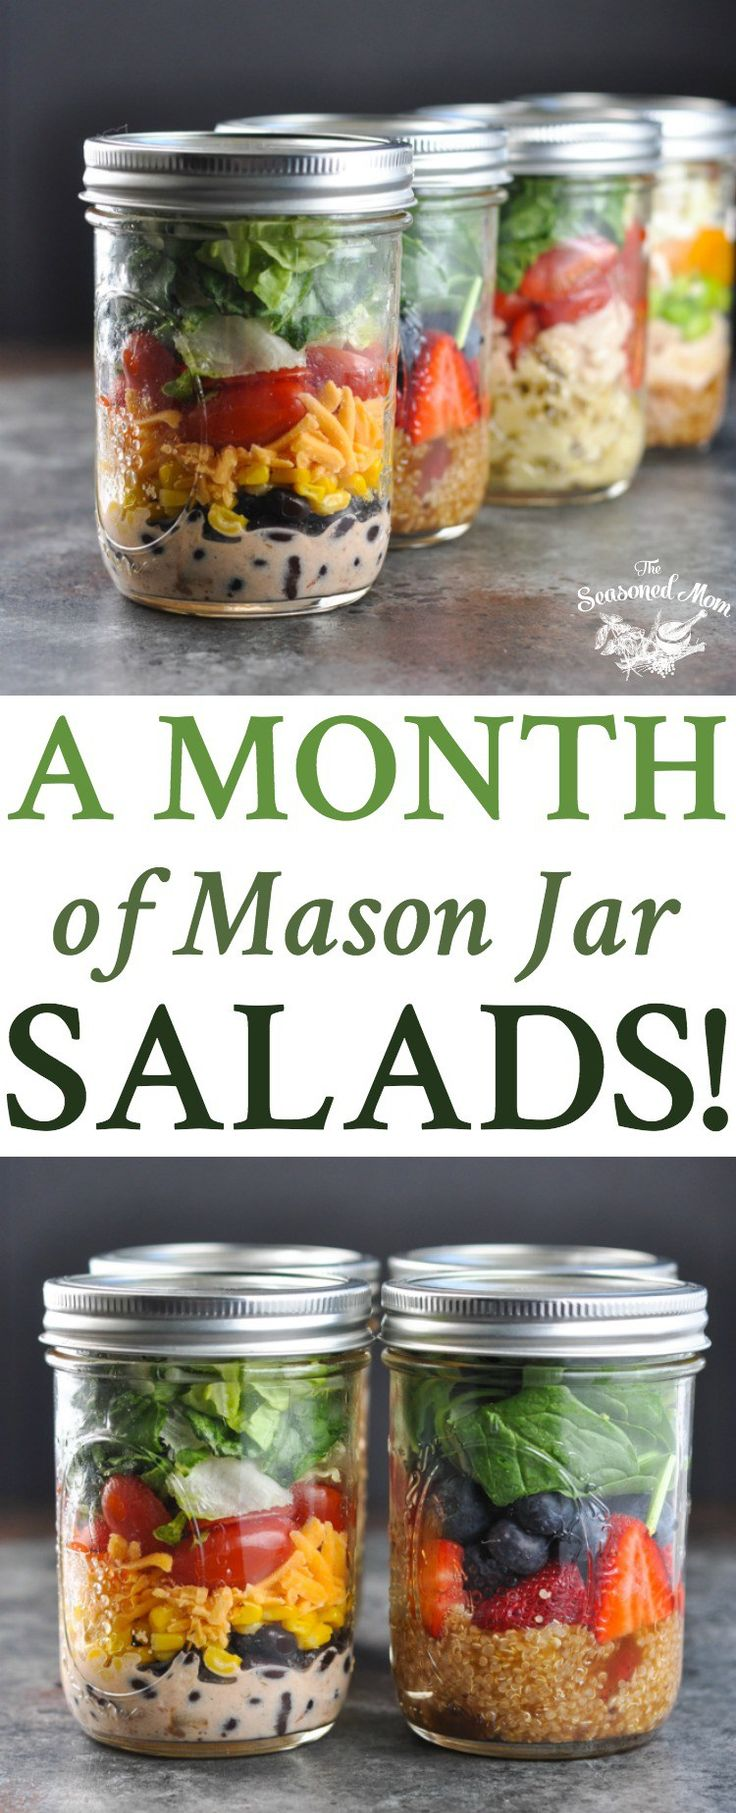 A Month of Mason Jar Salads! Meal Prep   Salad Recipes   Meal Prep for the Week   Meal Prep Recipes   Healthy Lunch Recipes   Lunch Ideas   Healthy Recipes   Healthy Dinner Recipes   Mason Jar Meals